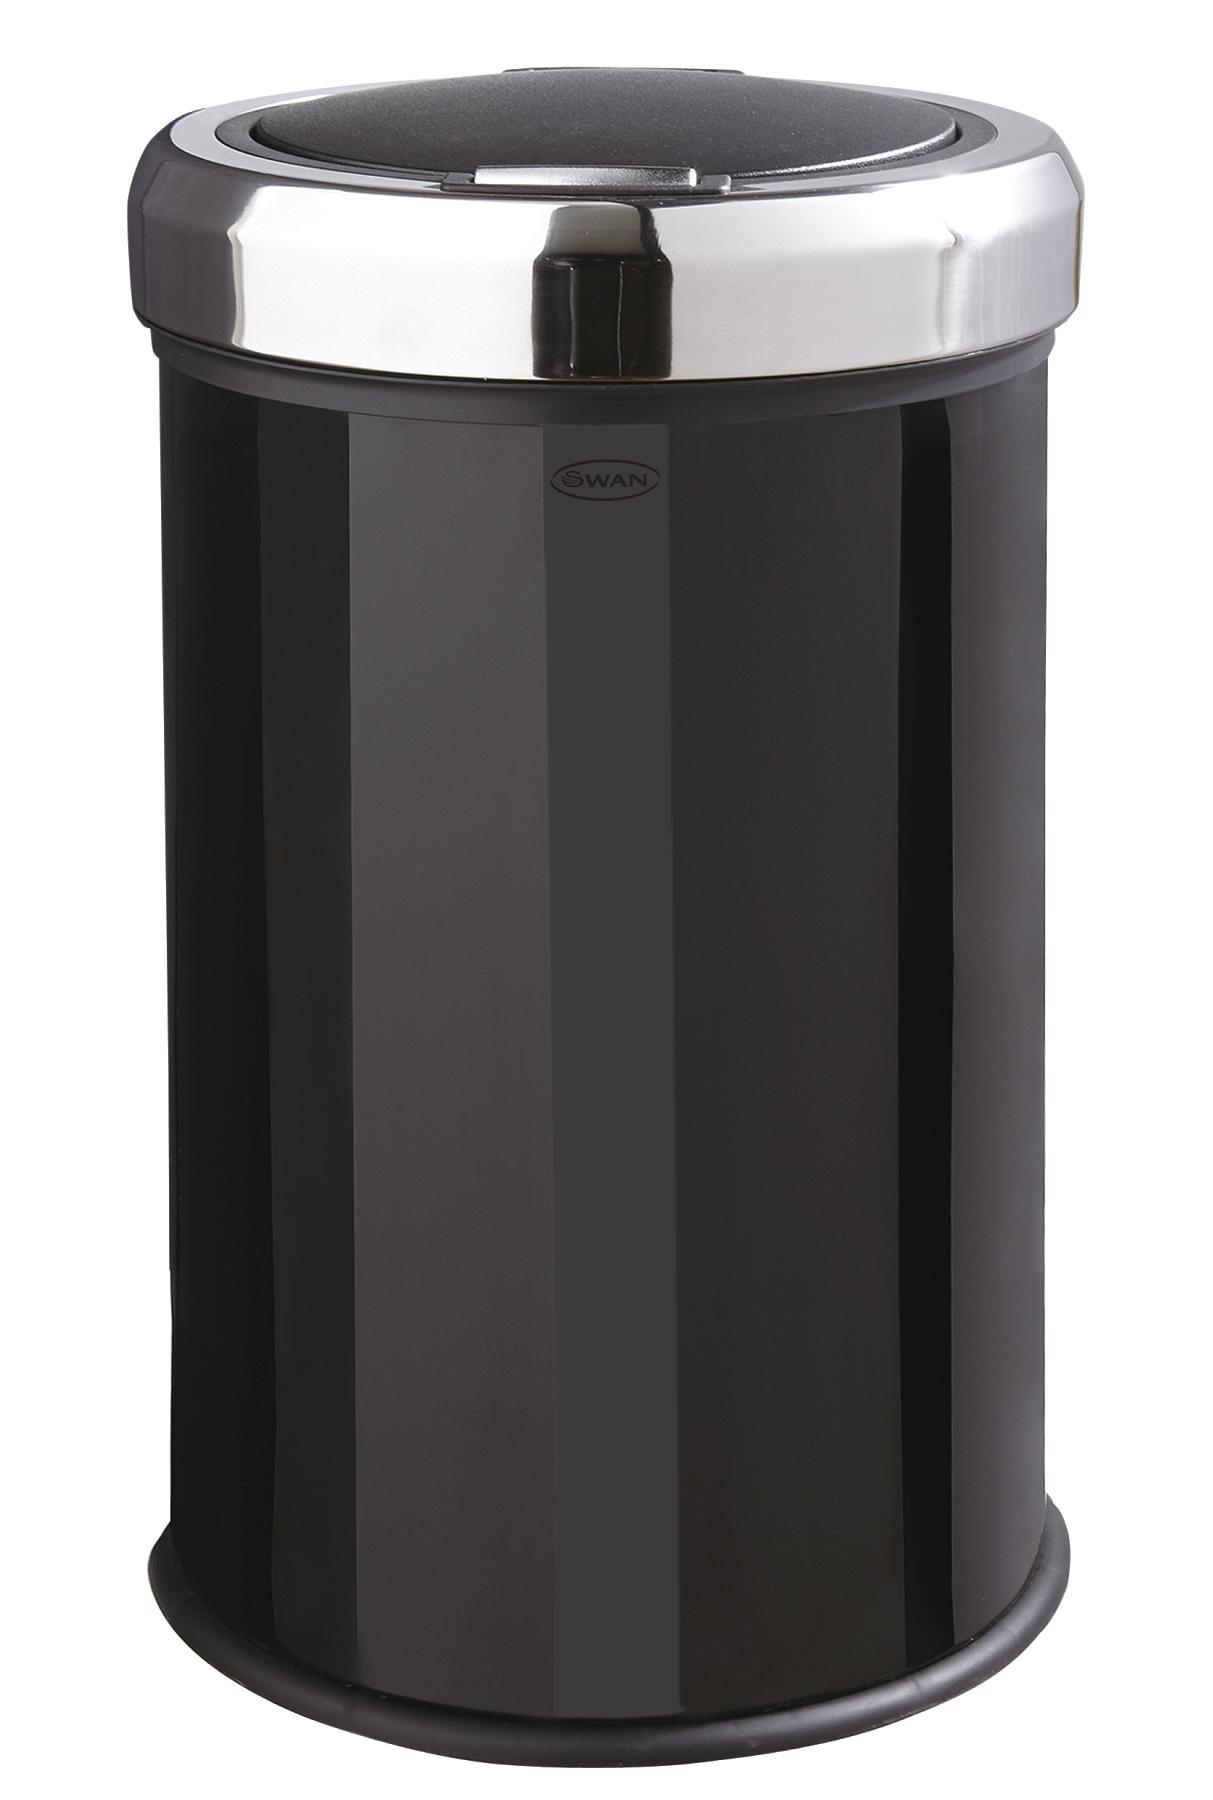 Sense Touch Bin 40-litre Touch Bin